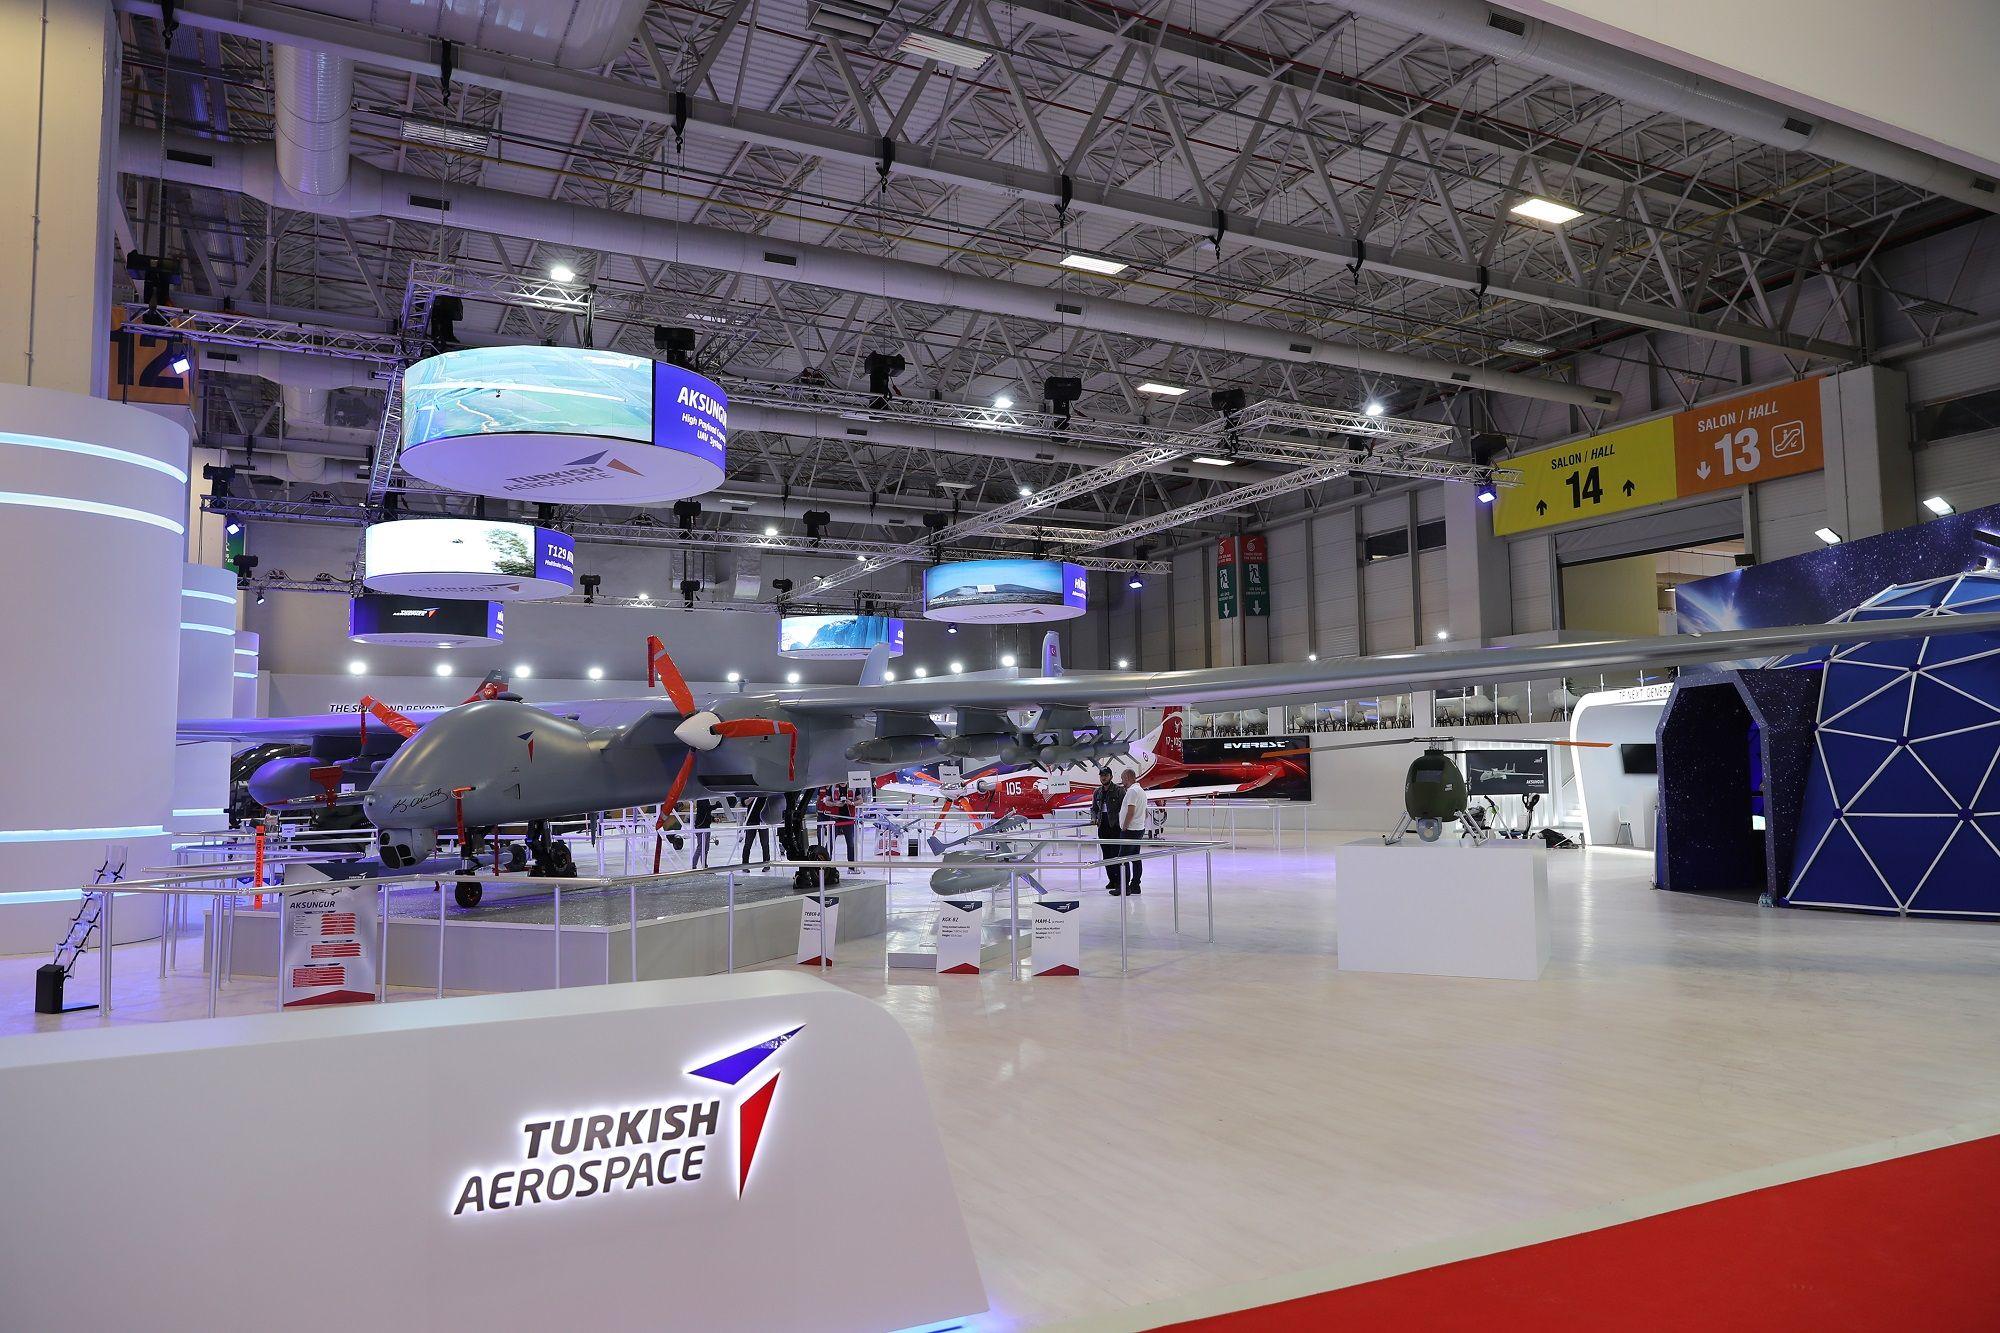 At IDEF 2019, Turkish Aerospace exhibits its ANKA-AKSUNGUR